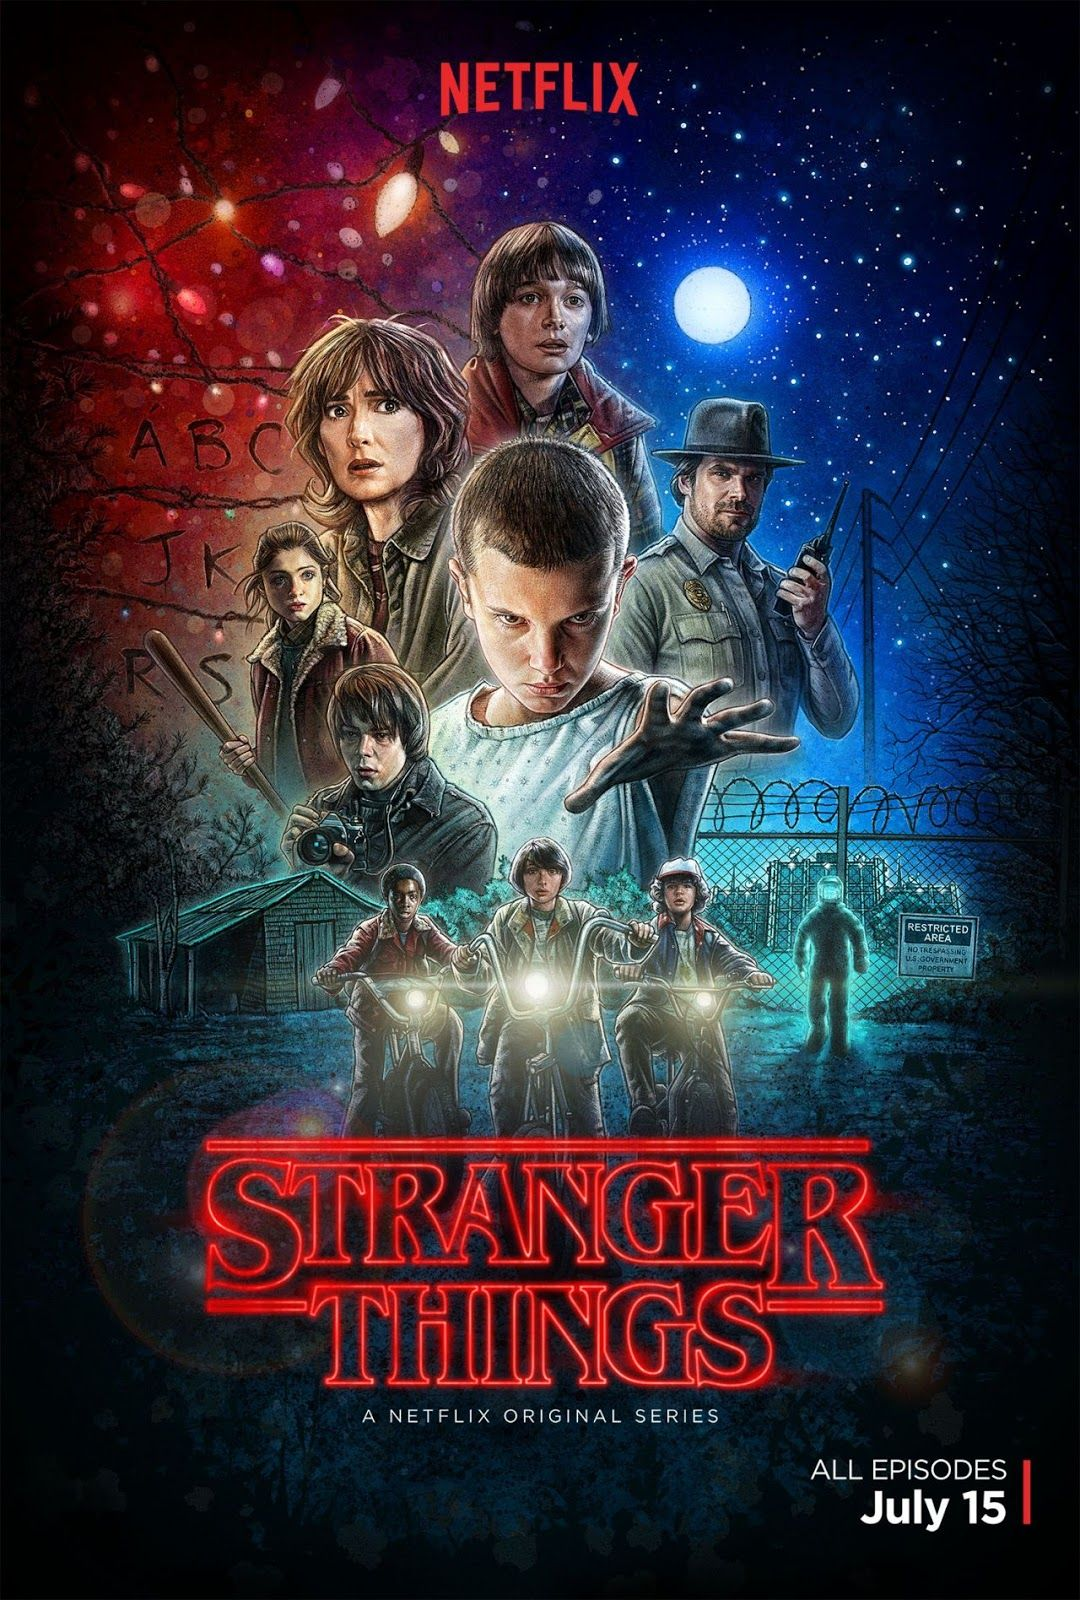 Stranger Things (2016) tainies Online anime movies